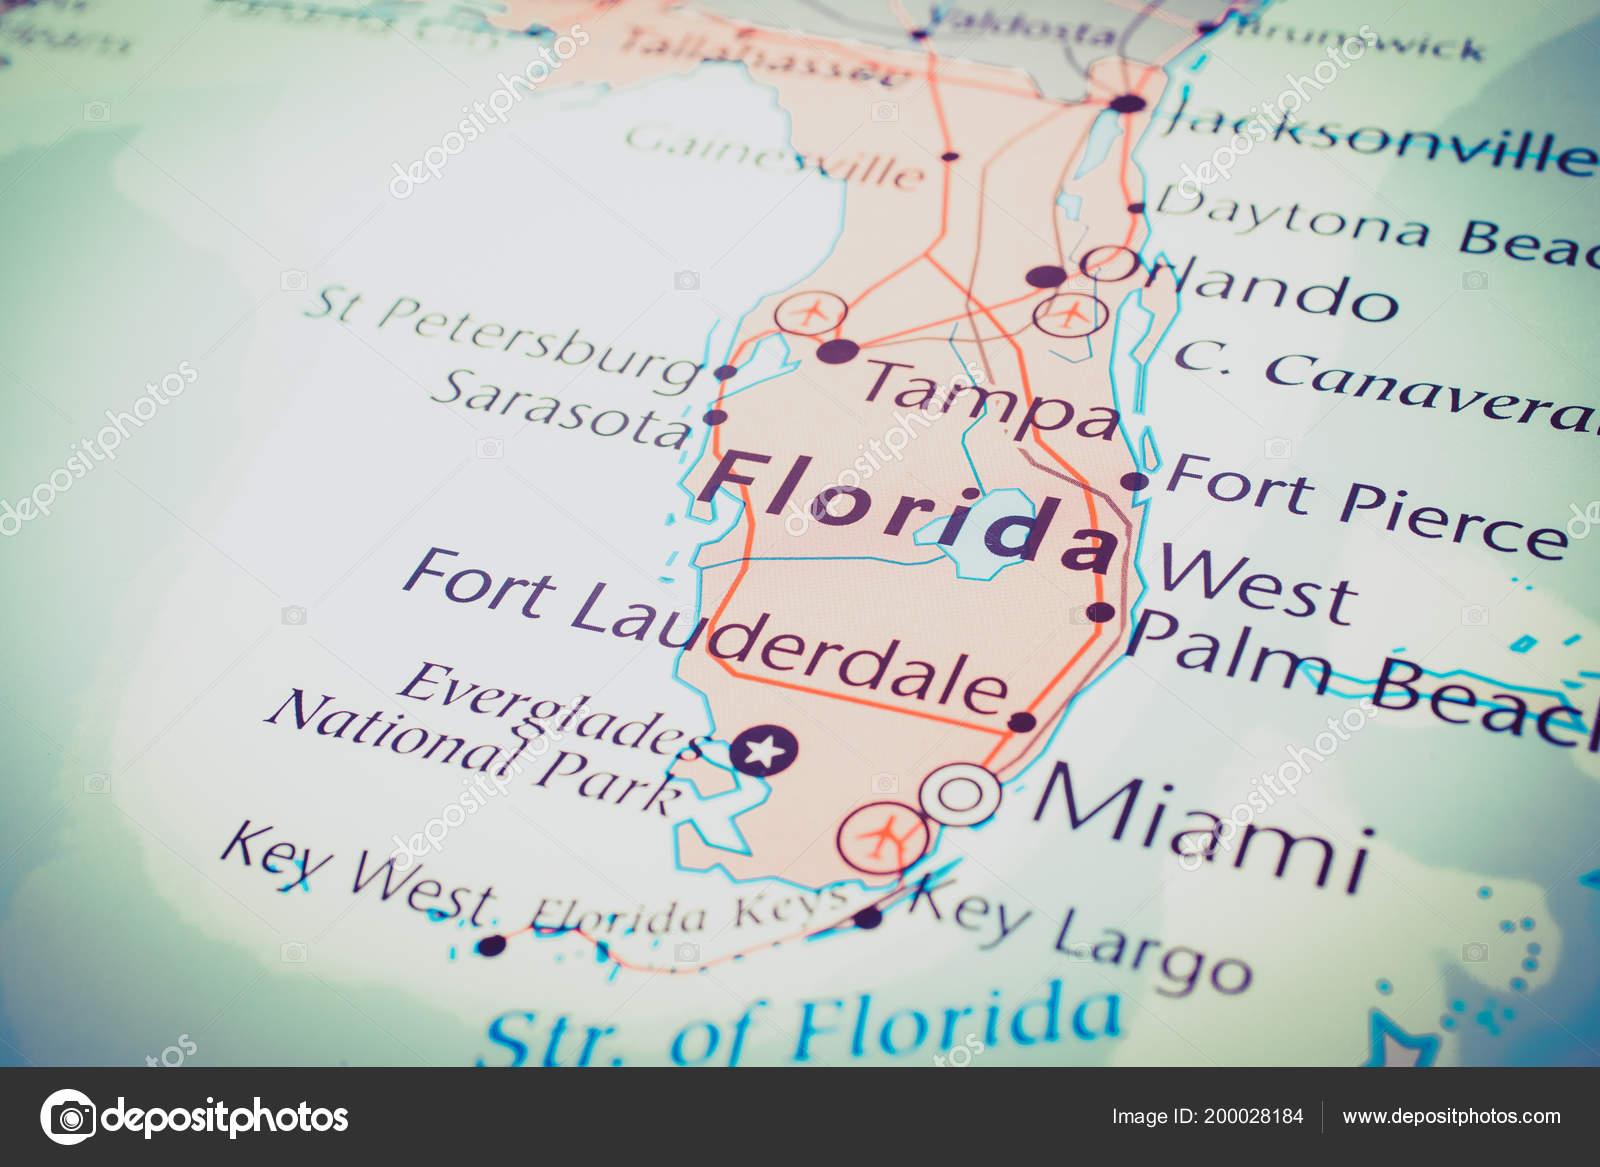 Florida Map World Map — Stock Photo © aallm #200028184 on hutchinson beach map, no name key map, siesta key sarasota map, sunset key map, miami map, largo sound map, marco island map, chokoloskee map, hawks key map, st. augustine beach map, bradenton area map, rodriguez key map, w palm beach map, florida map, ramrod key map, big pine key map, daytona beach map, rockland key map, anna maria island map, lakewood park map,